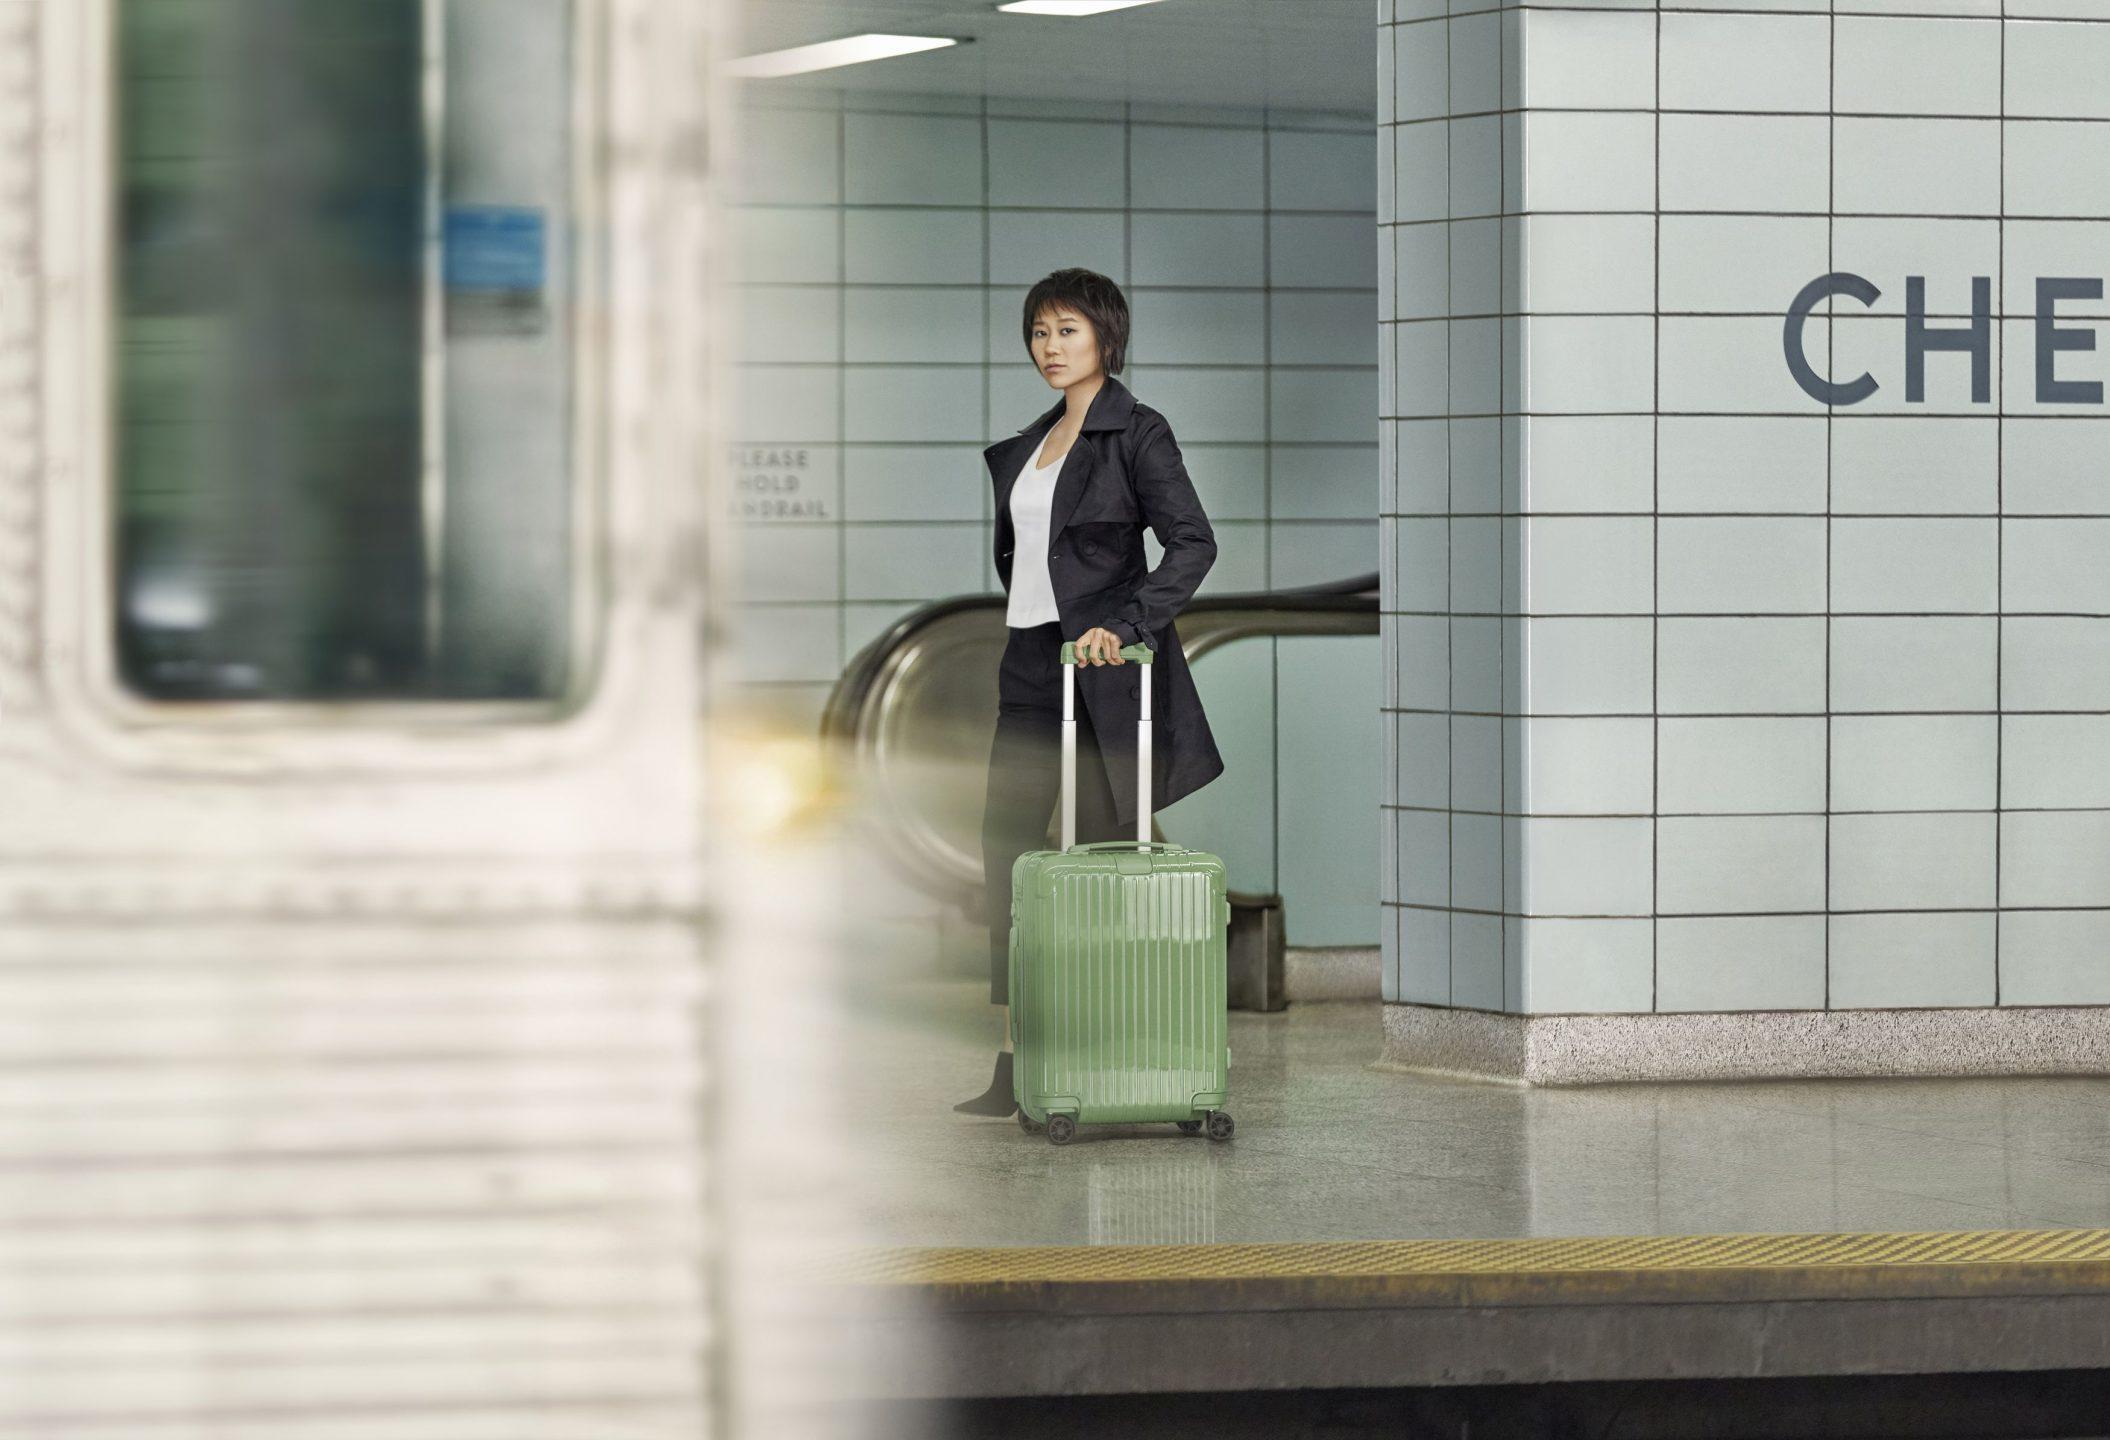 valigia persona strada